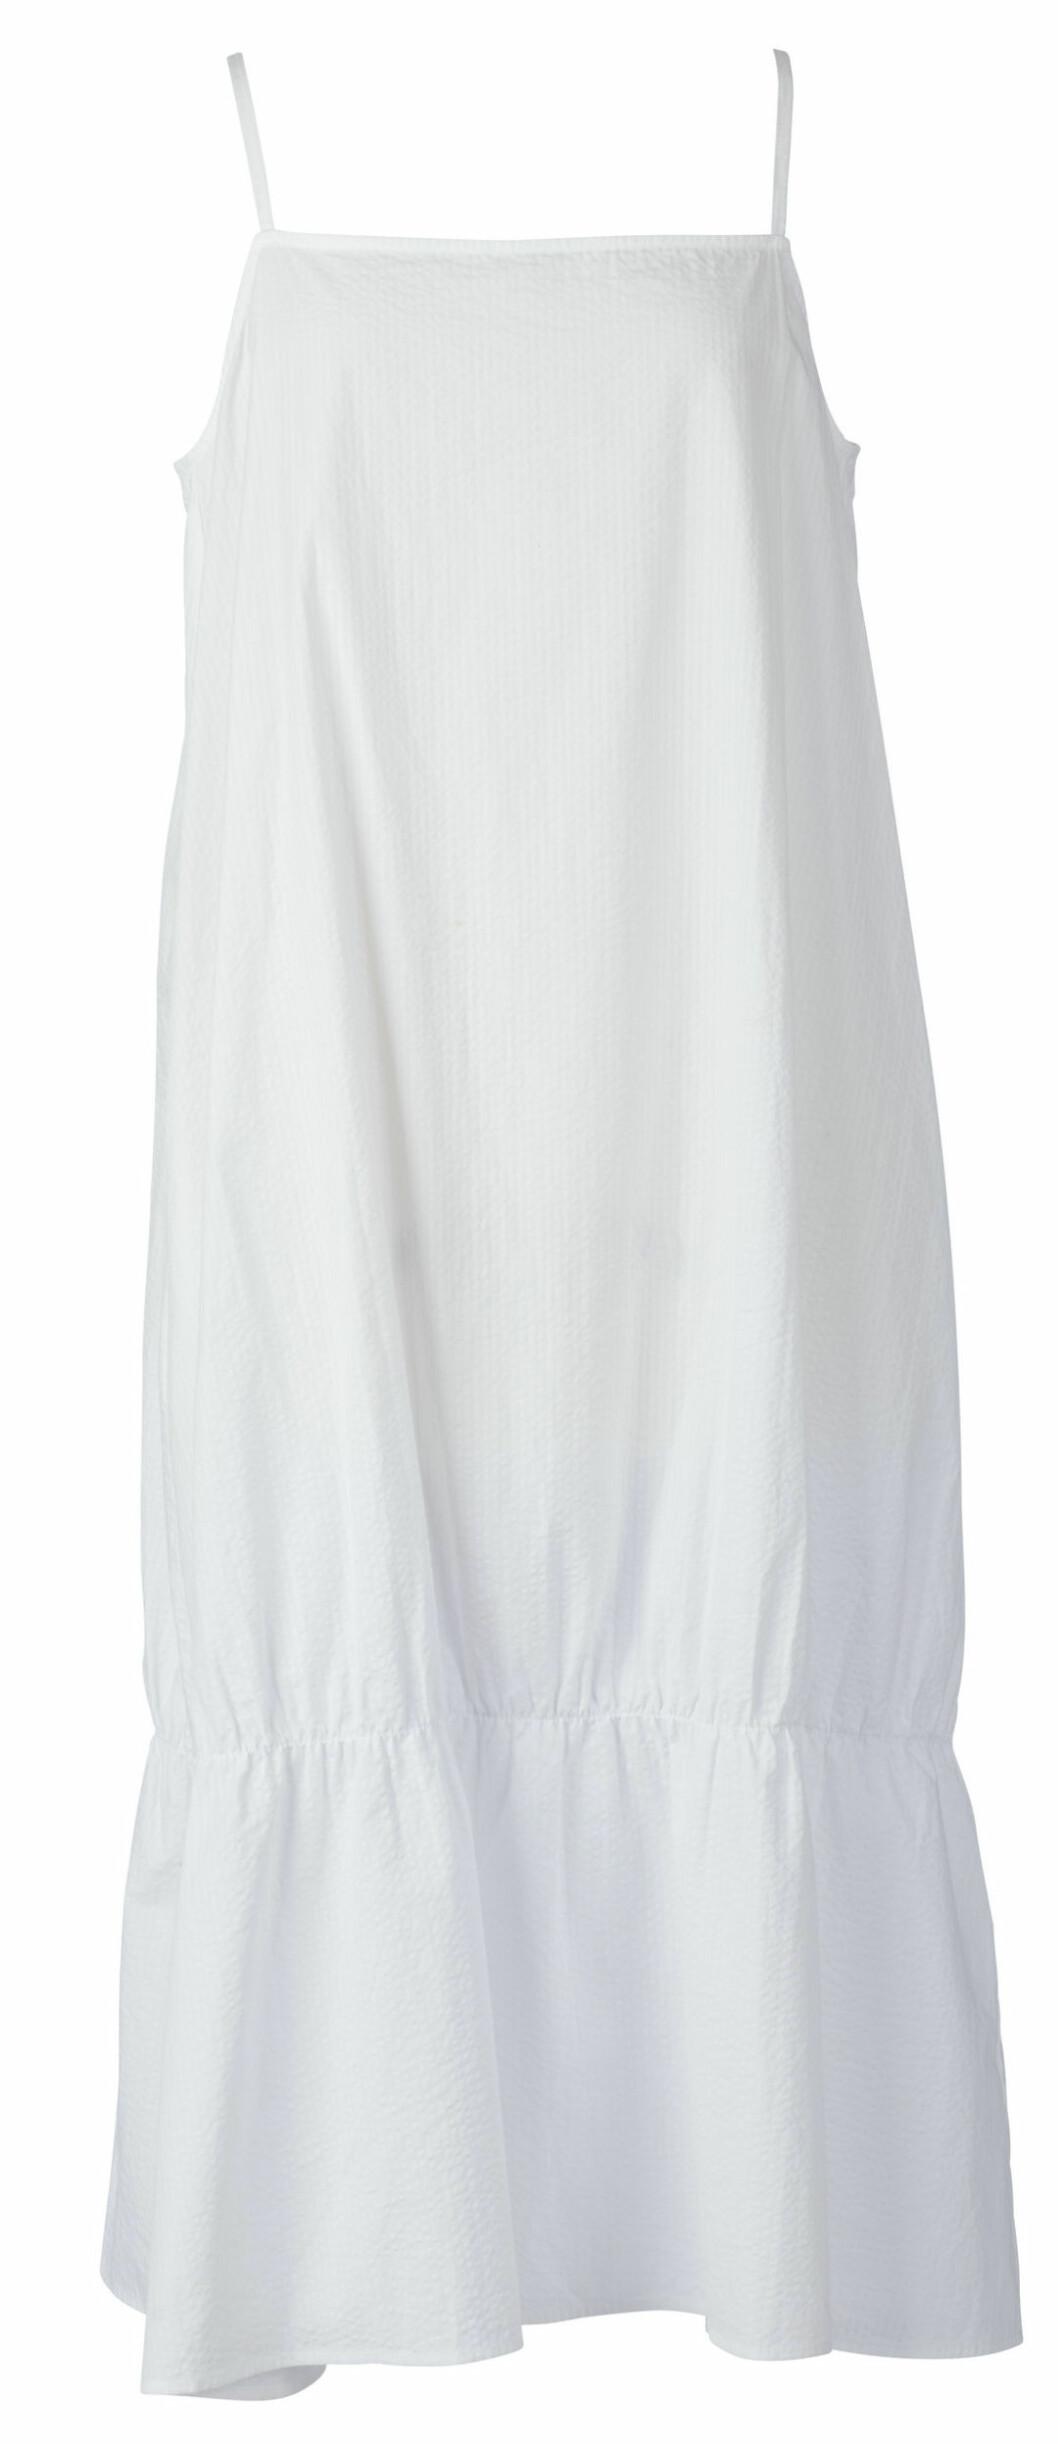 vit klänning från Stylein.